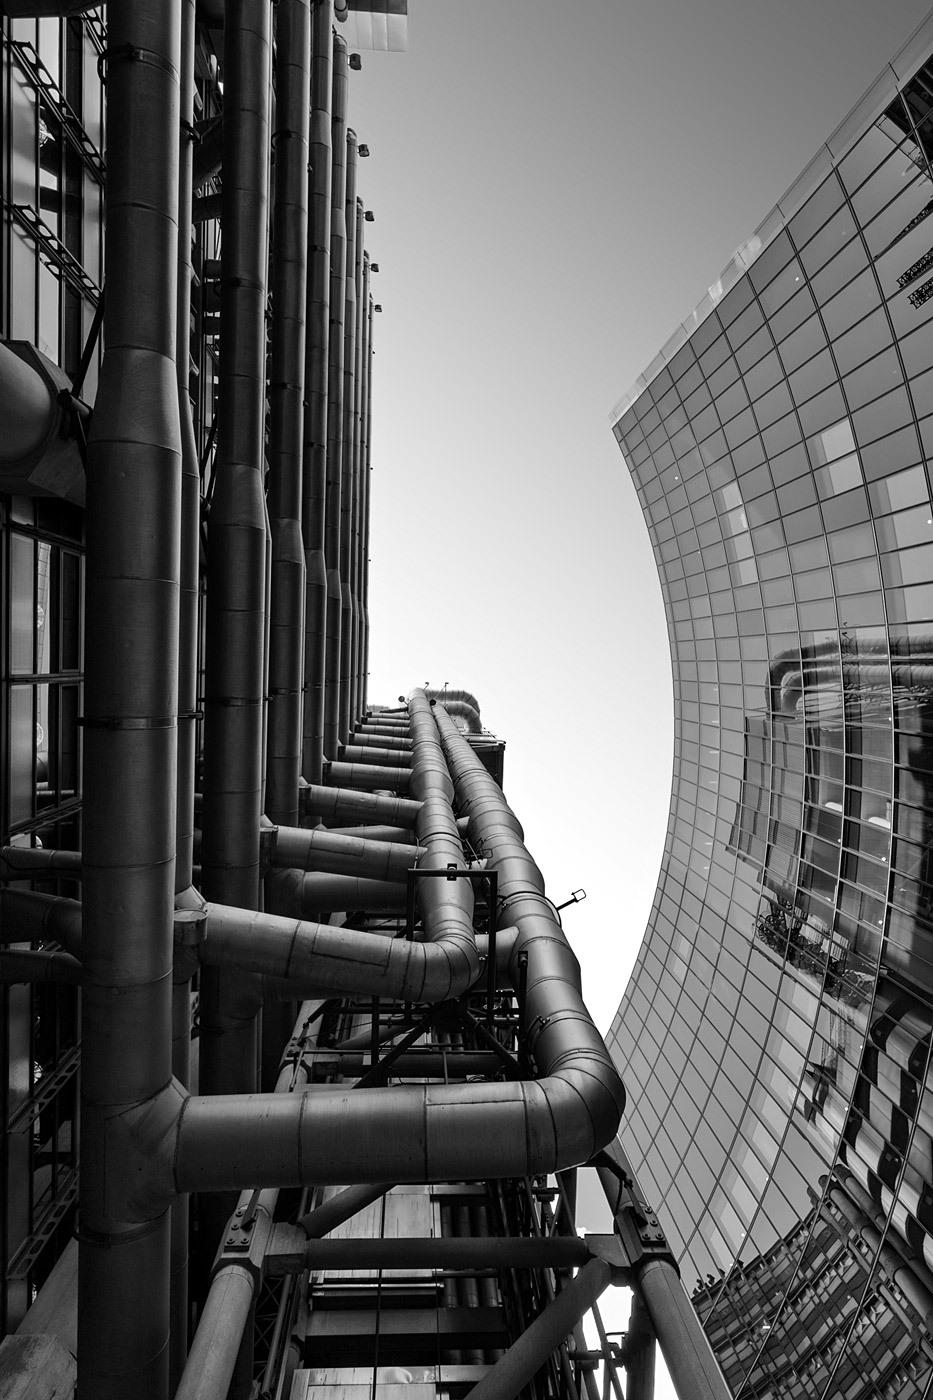 (left) Lloyd's building, London. Architect: Richard Rogers. (right) Willis Building, London. Architect: Norman Foster. © Edward Neumann / EMCN